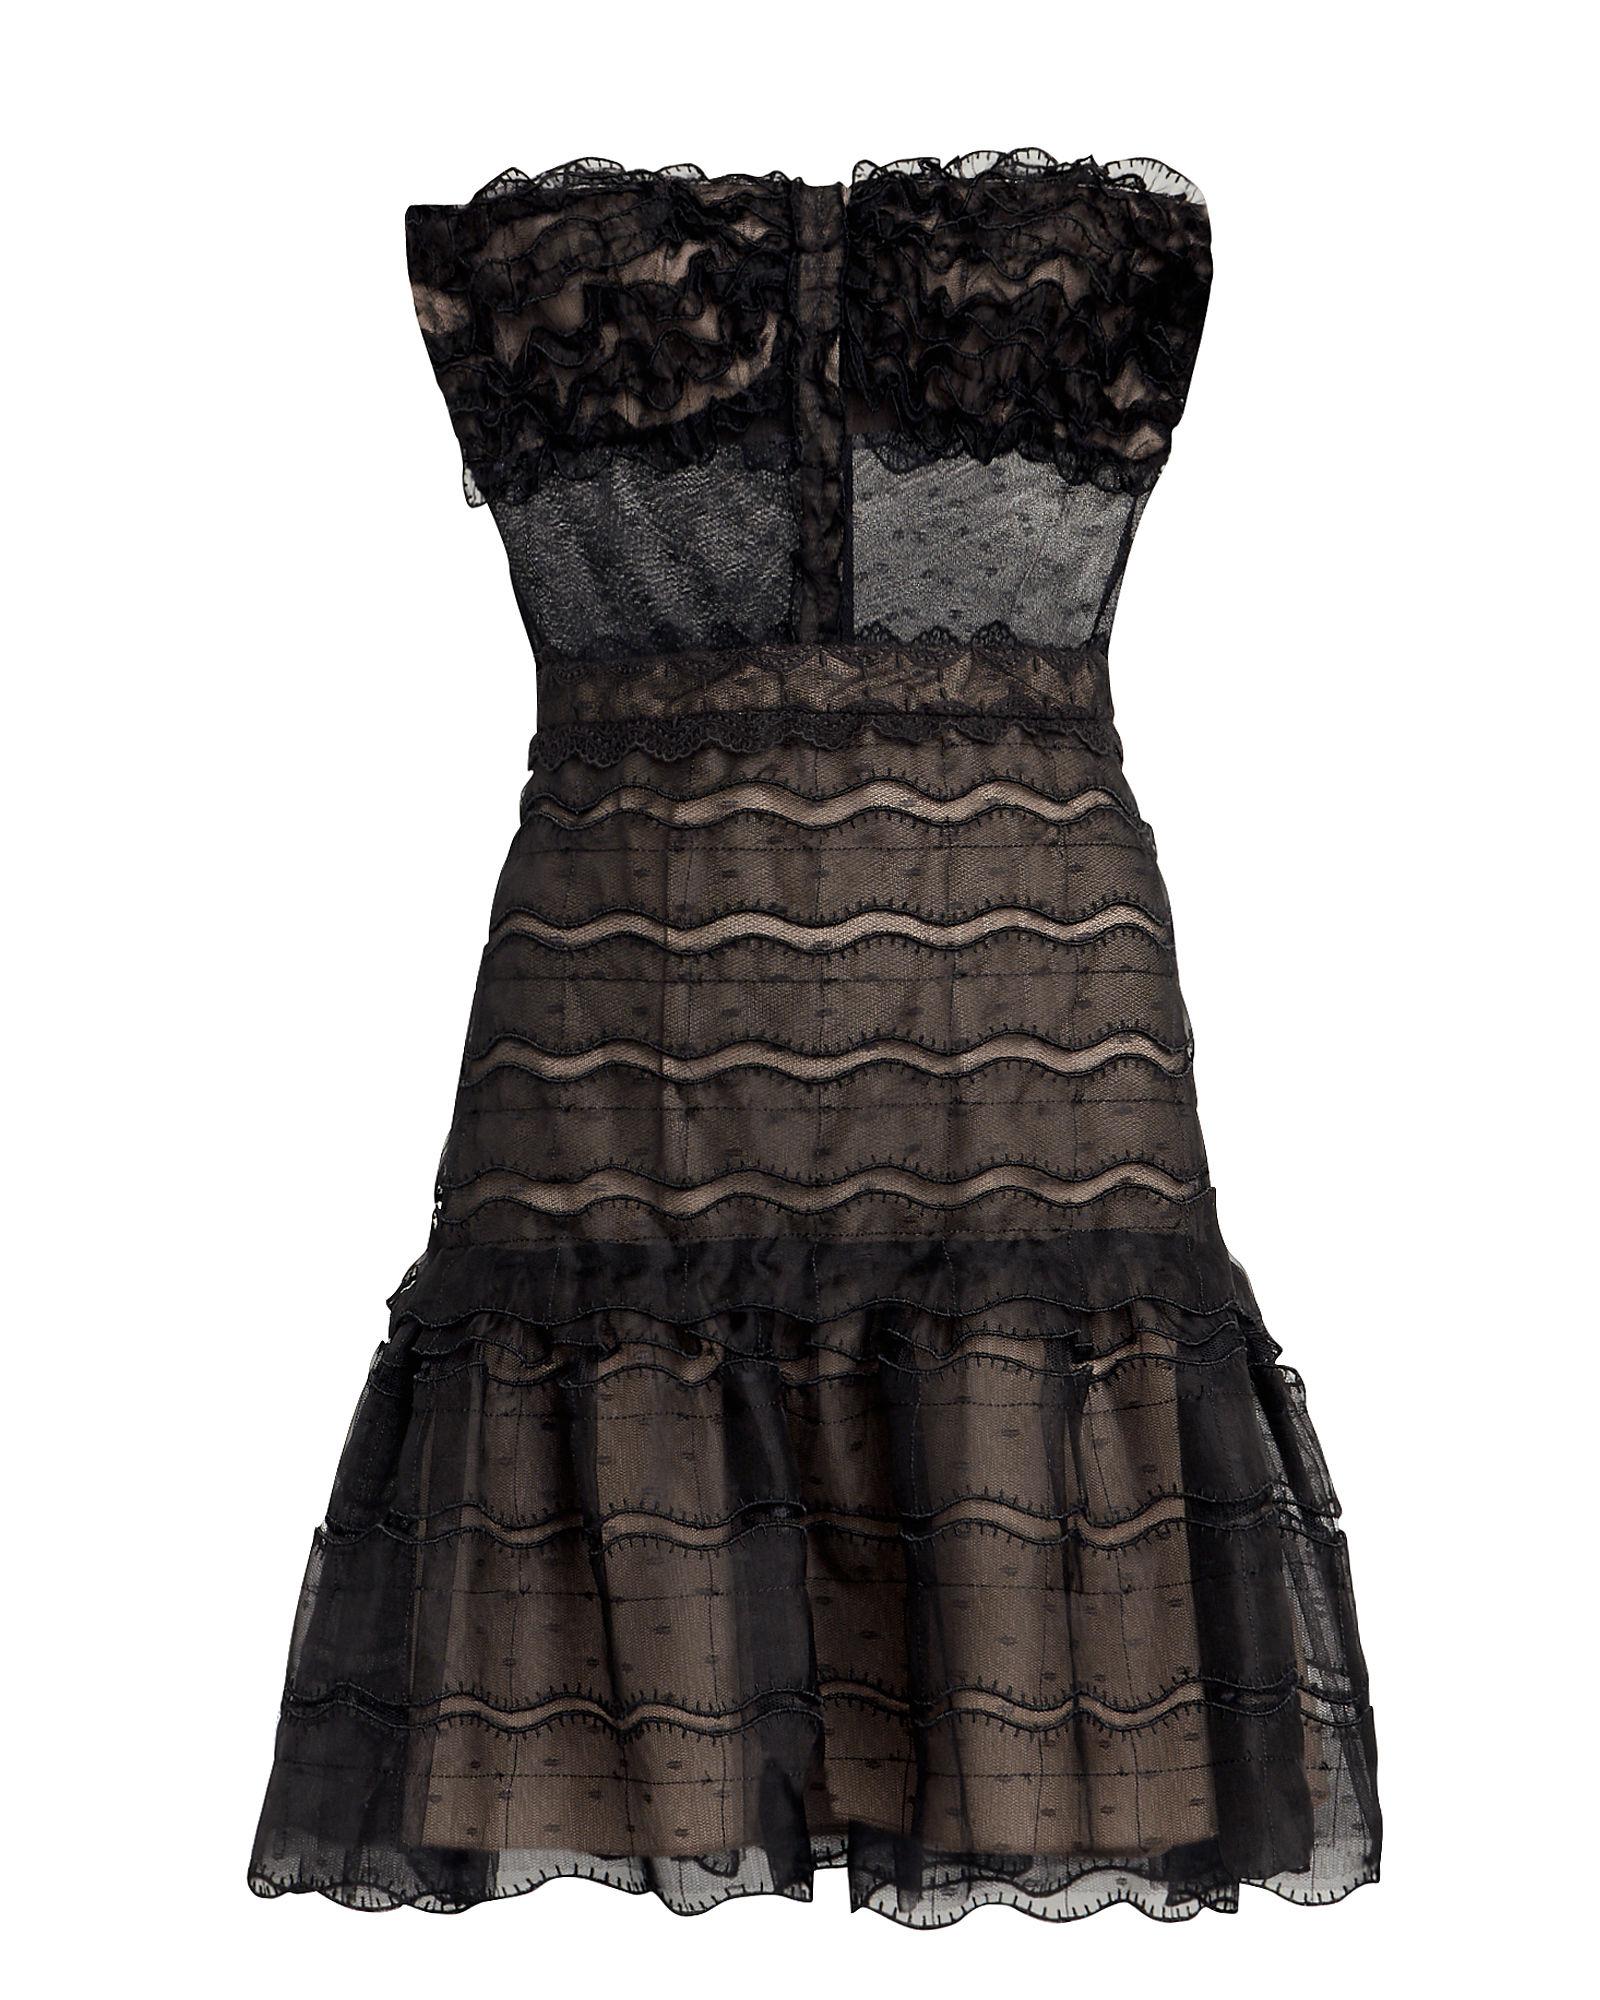 Adlai Bustier-Look Dress